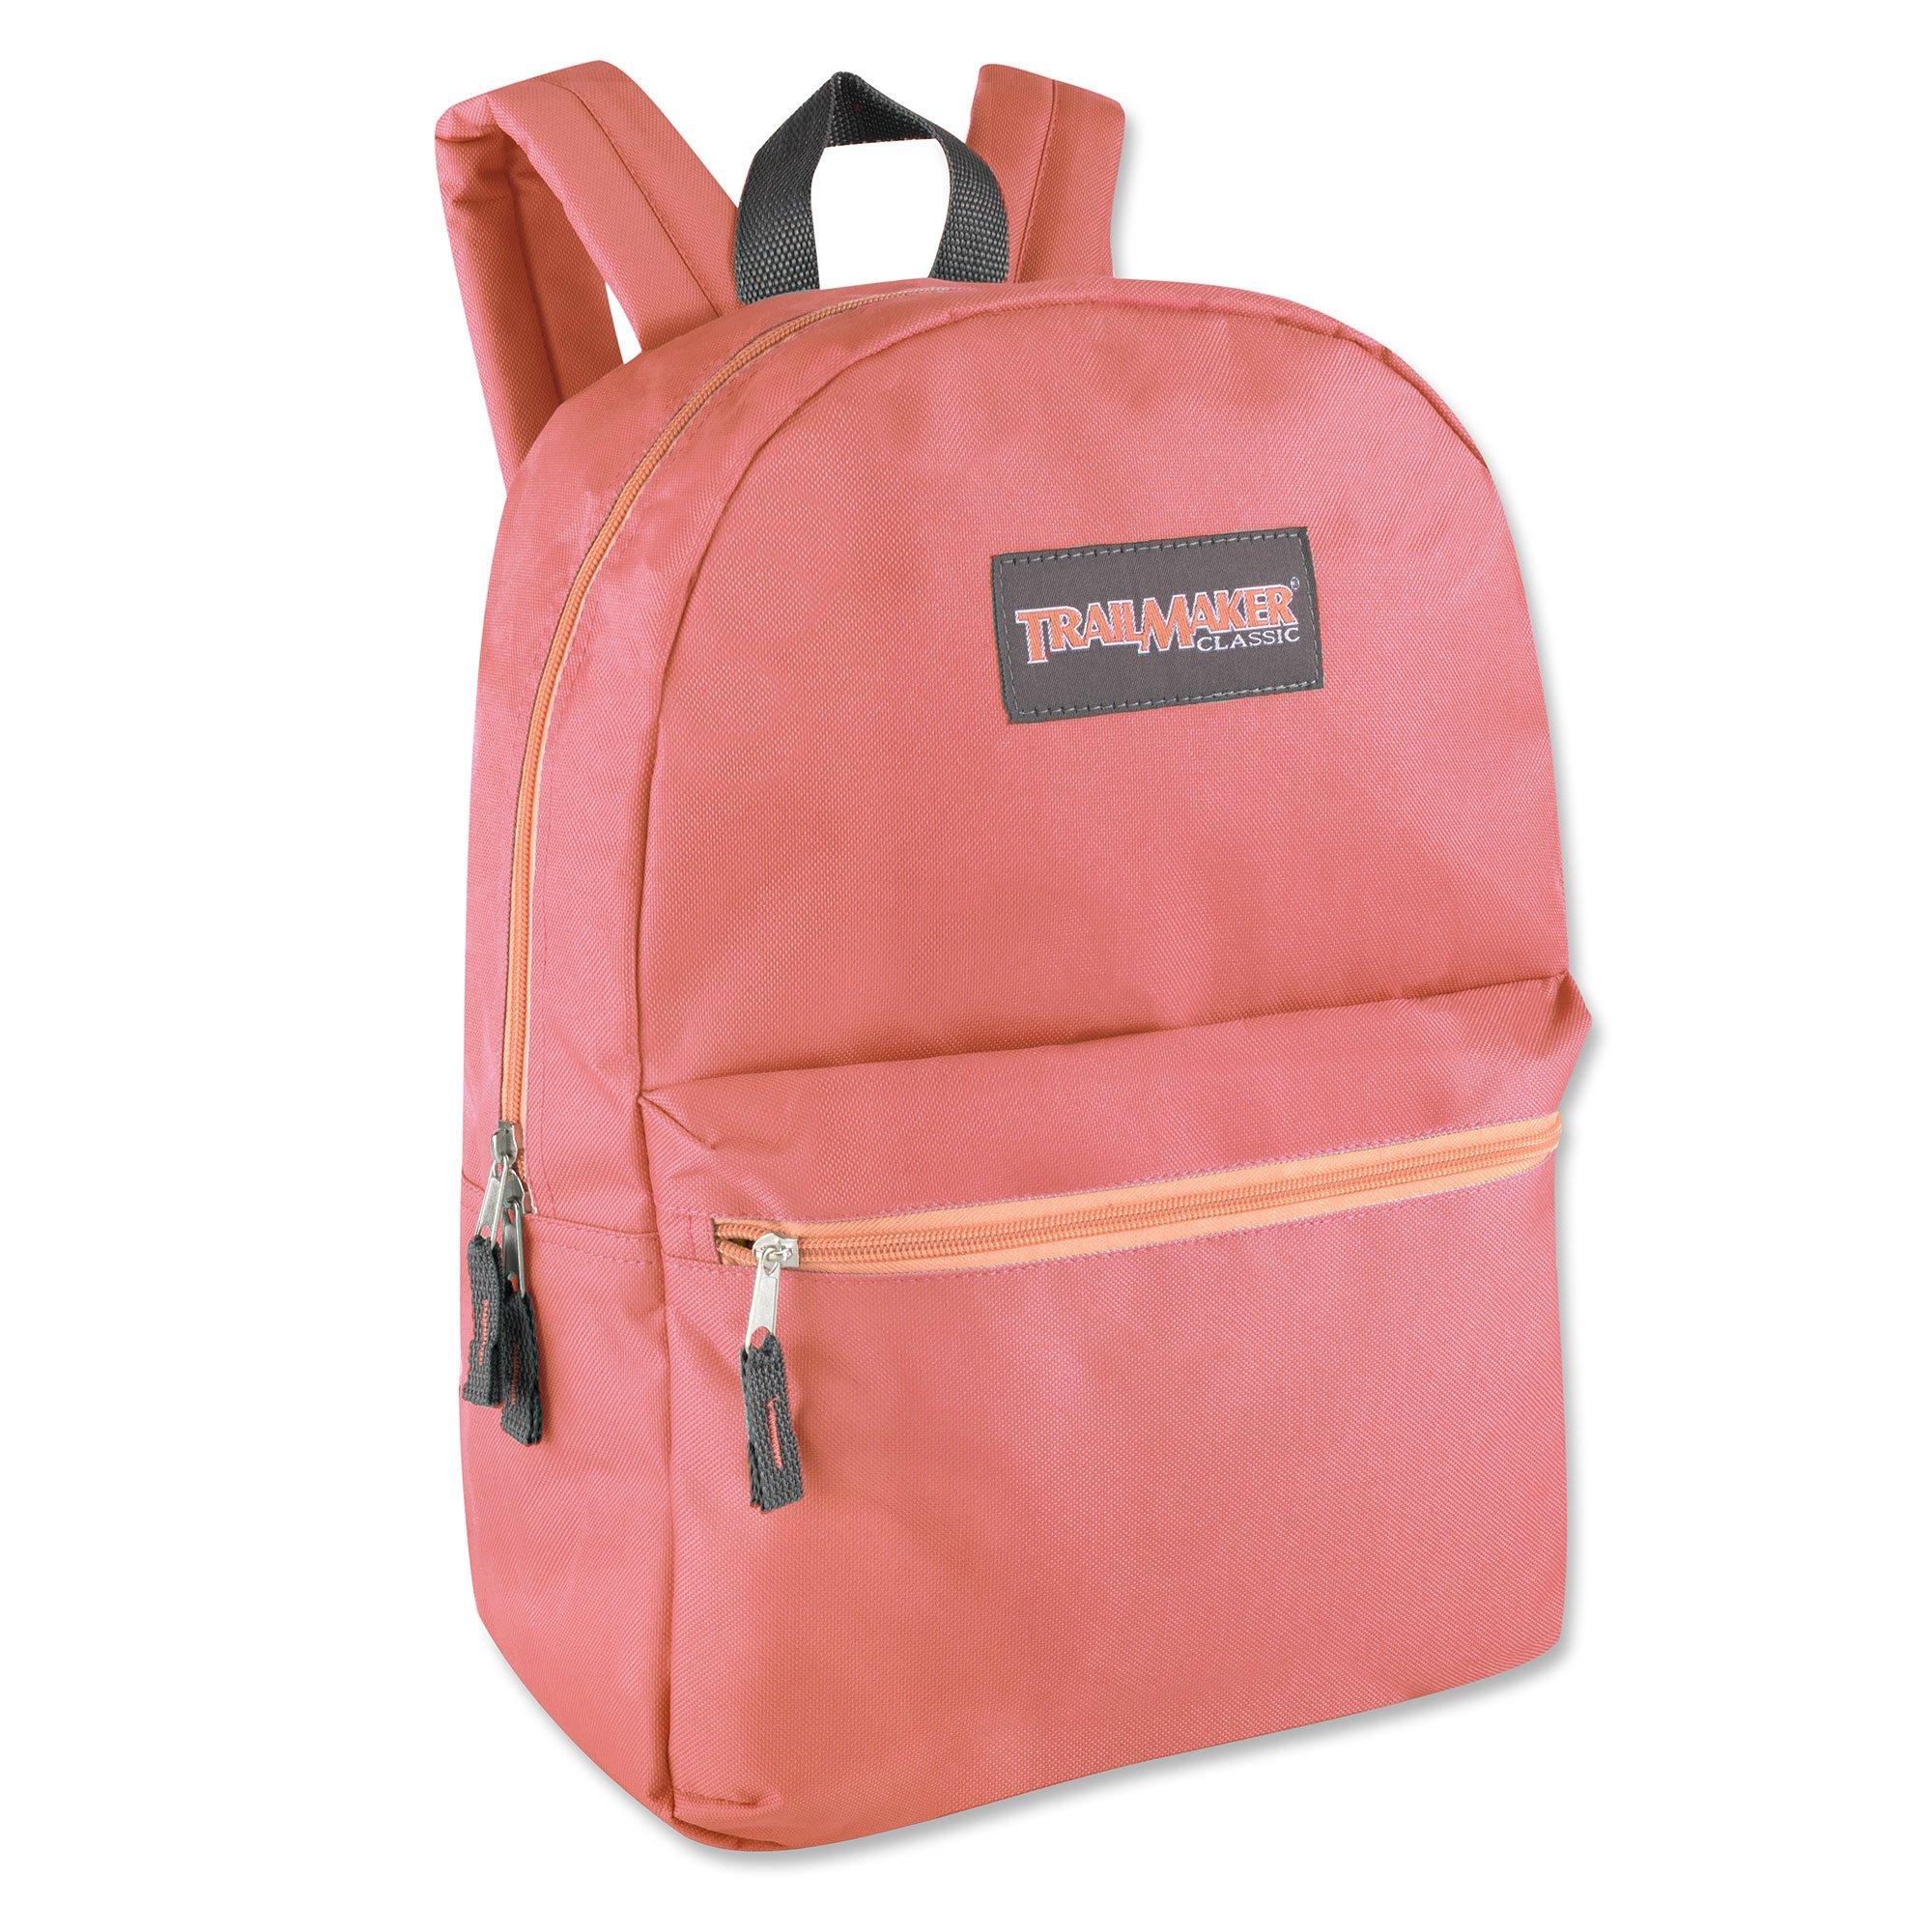 17'' Trailmaker Backpack Dark Peach w Peach Zipper by Trail maker (Image #1)